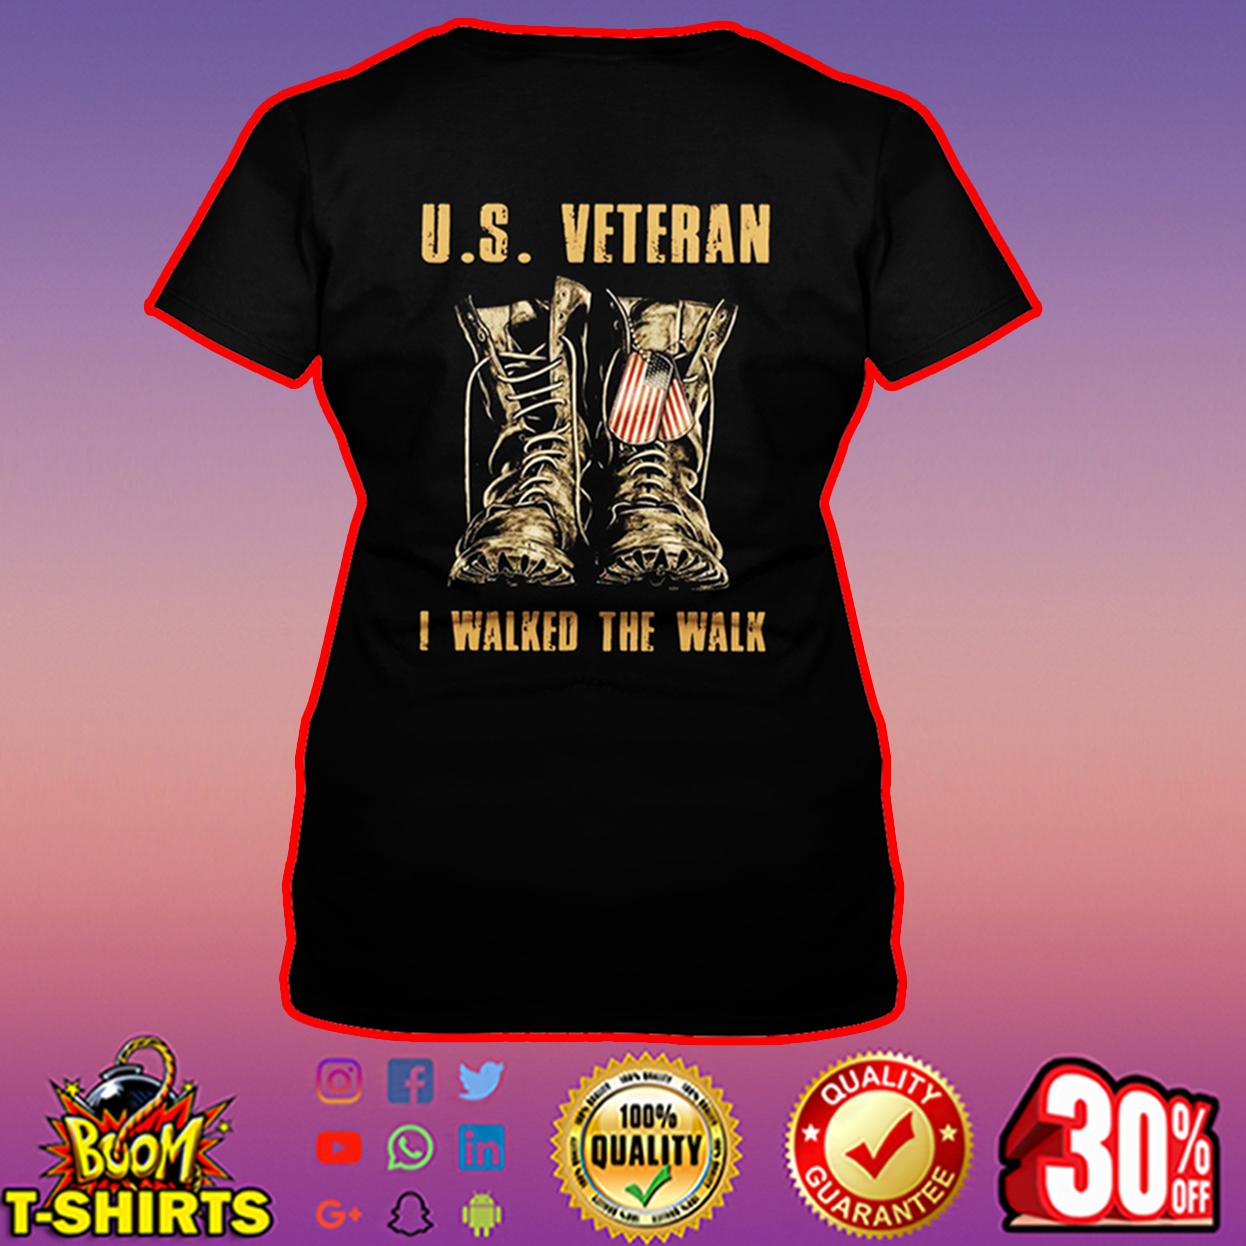 U.S. Veteran I walked the walk v-neck